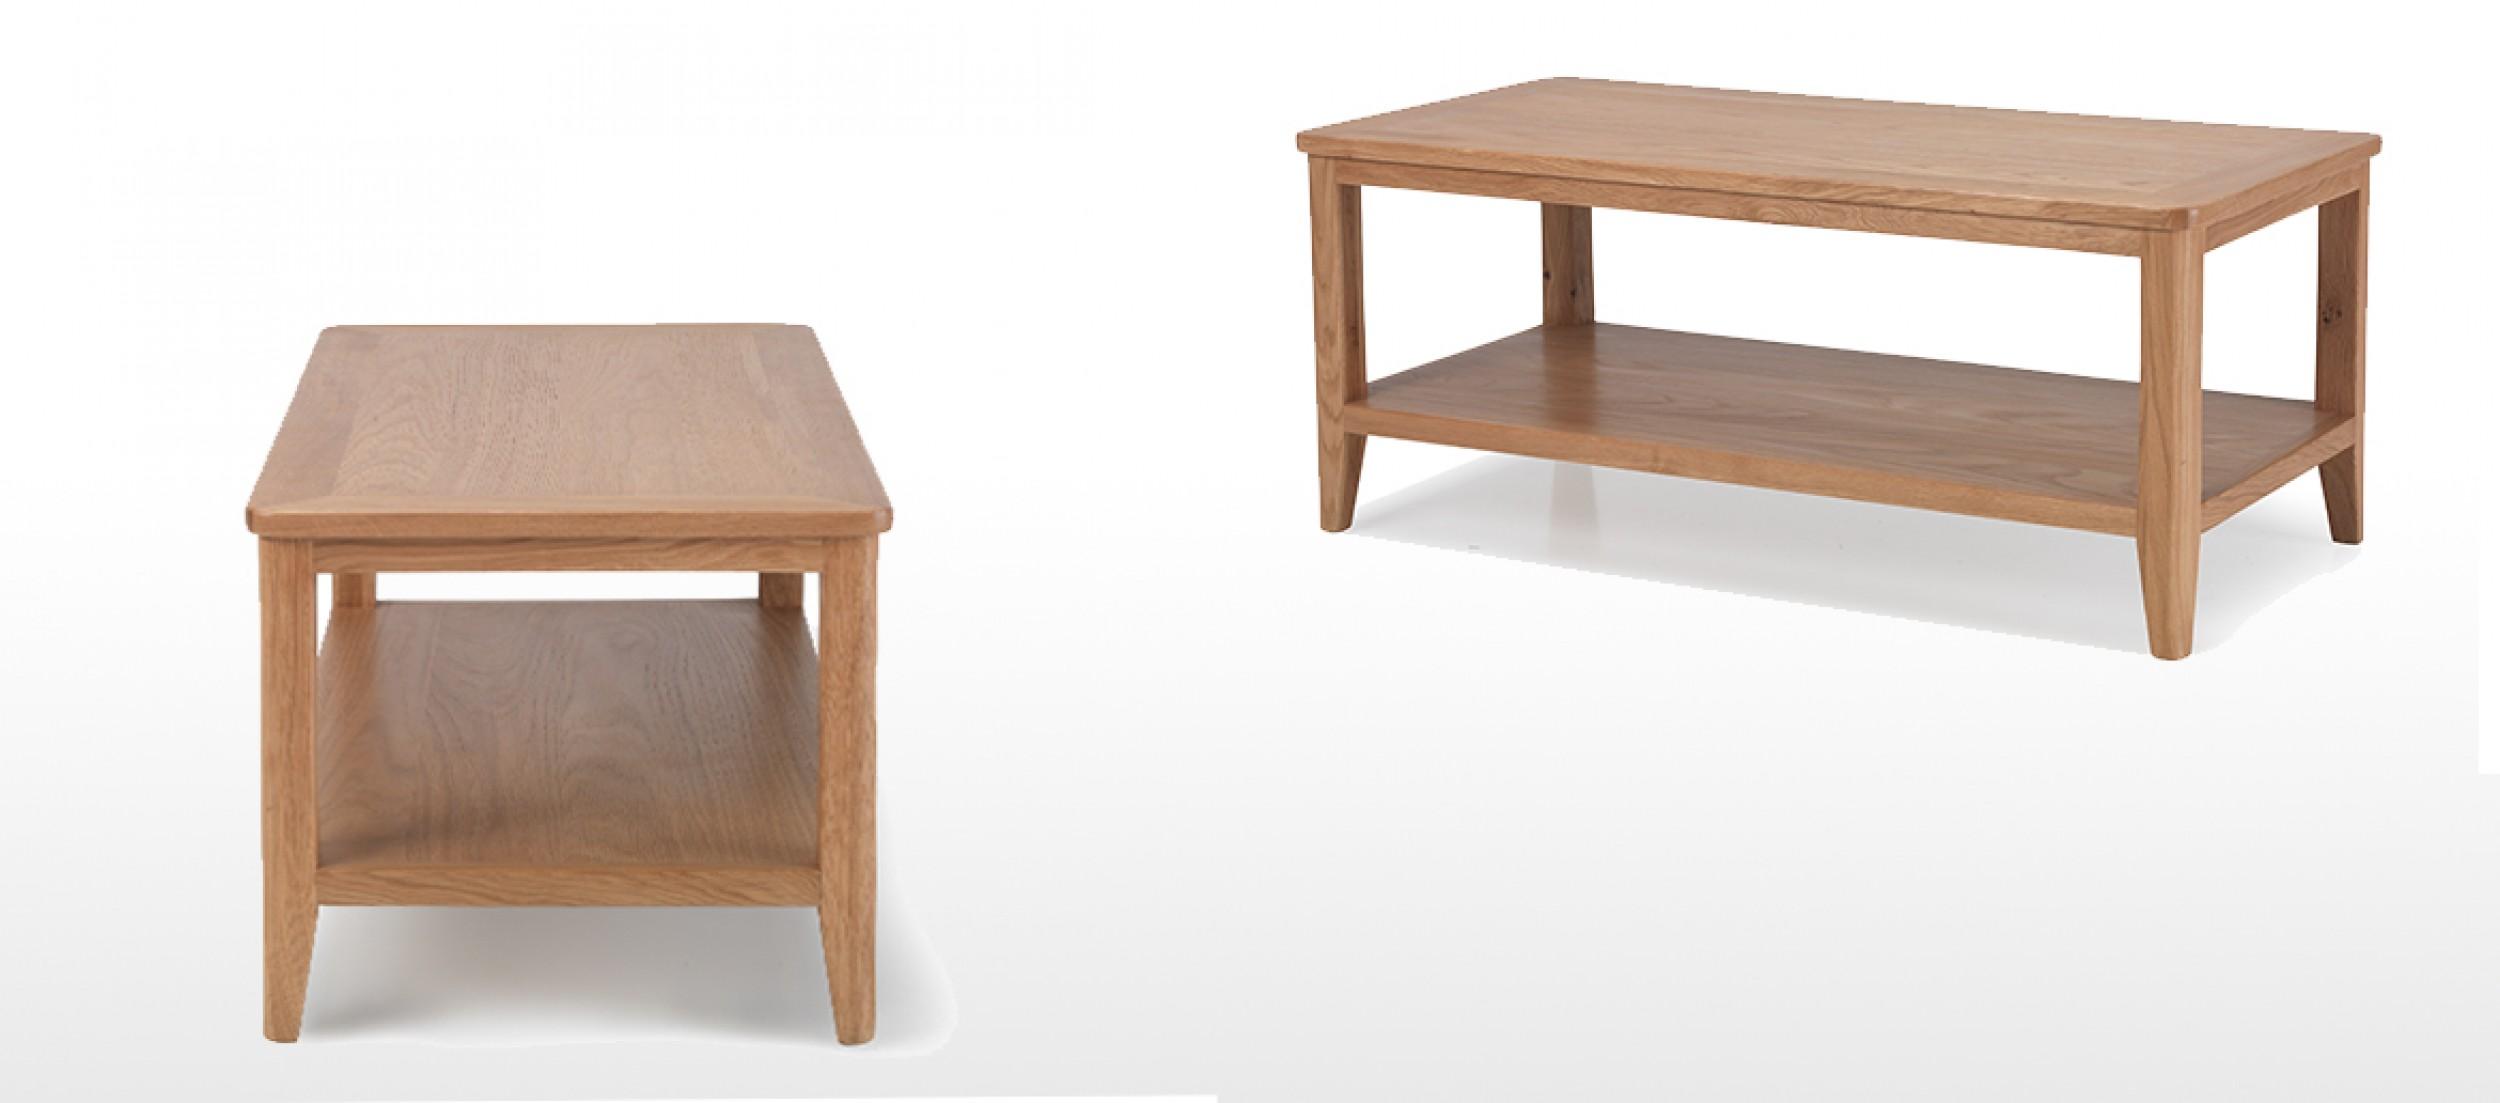 Eklund Oak Coffee Table With Shelf Quercus Living